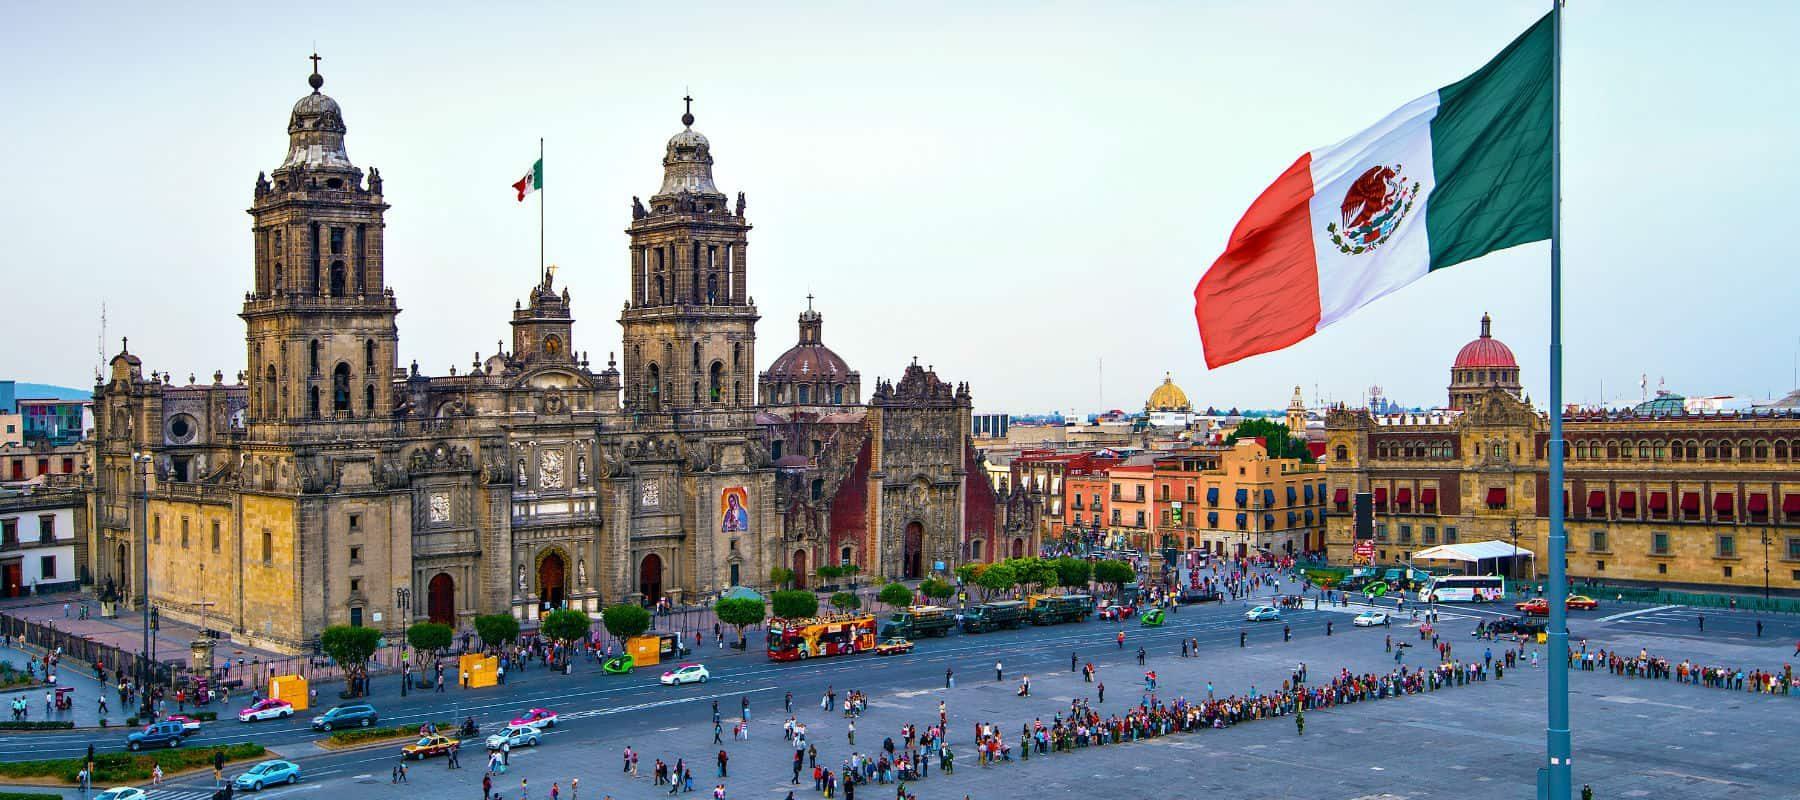 Turismo Ciudad de Mexico City Travel Guide